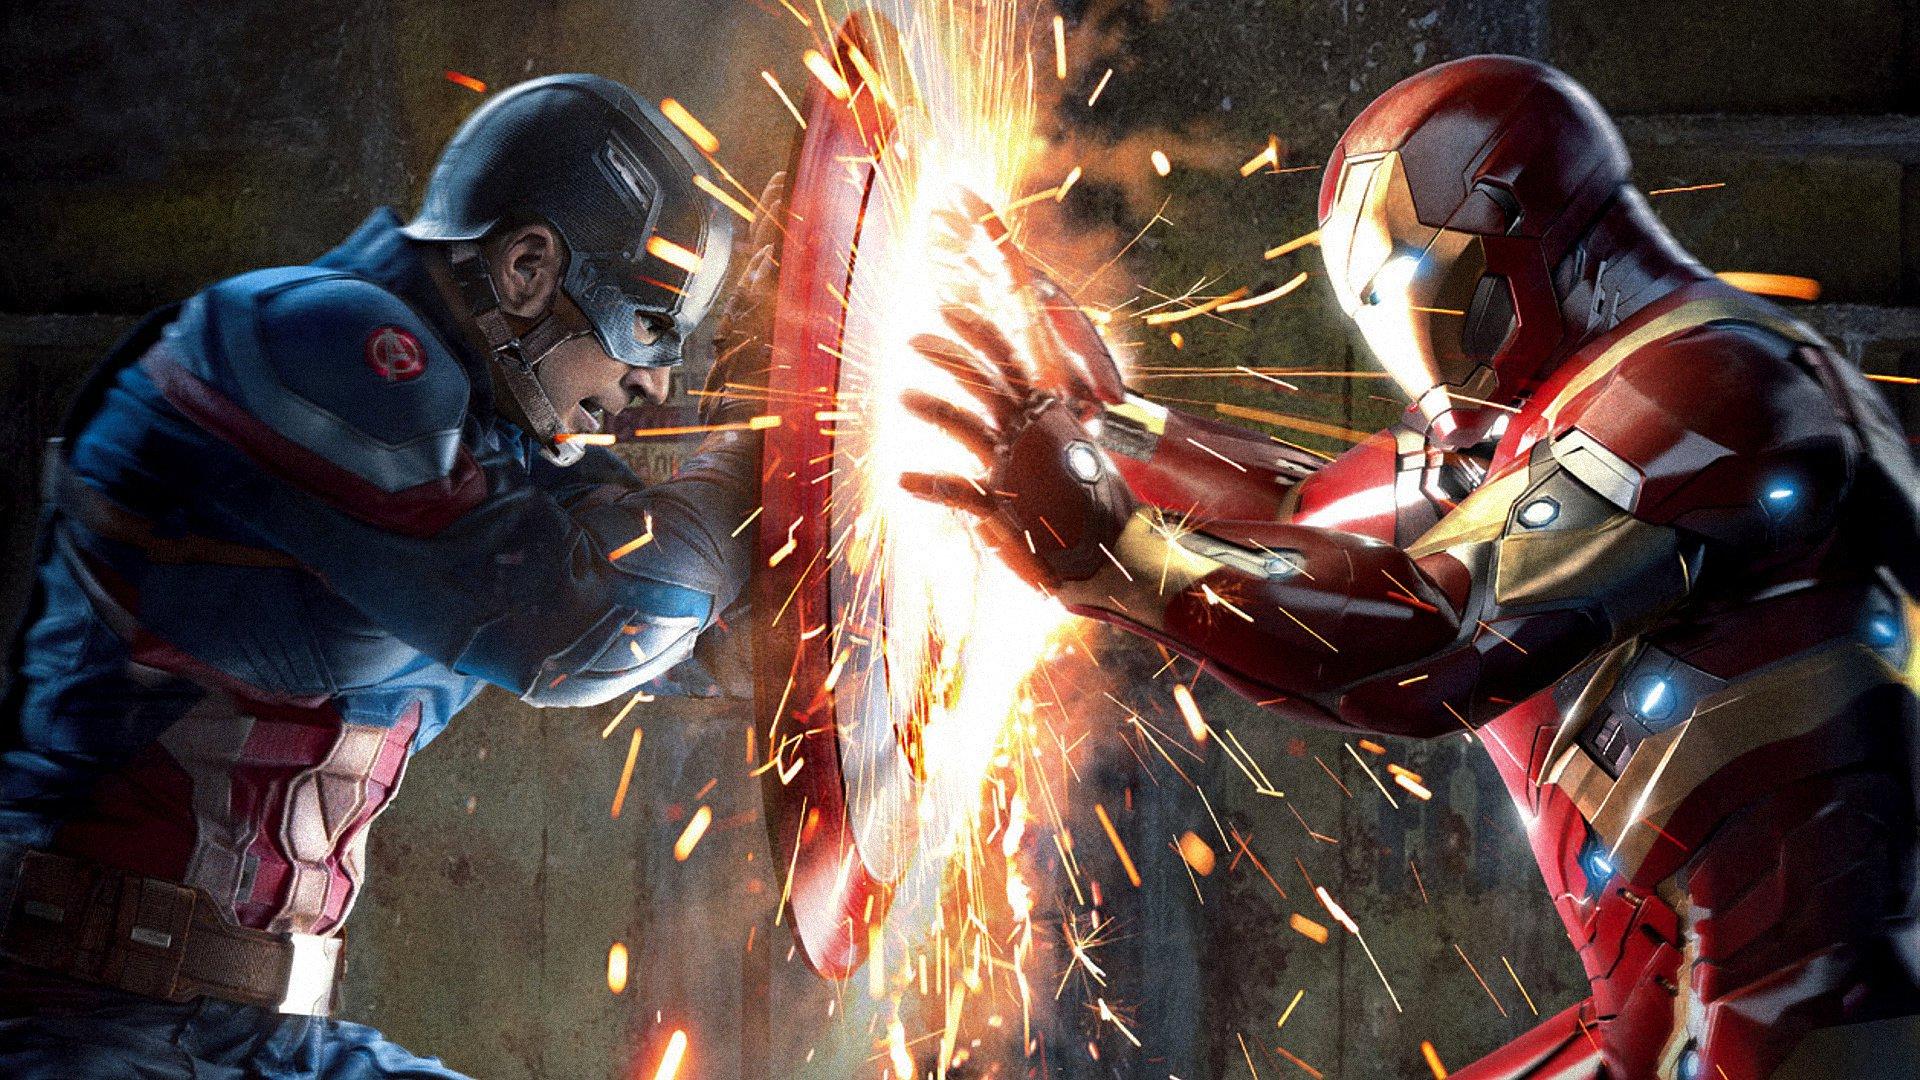 Captain America: Civil War Backgrounds, Pictures, Images